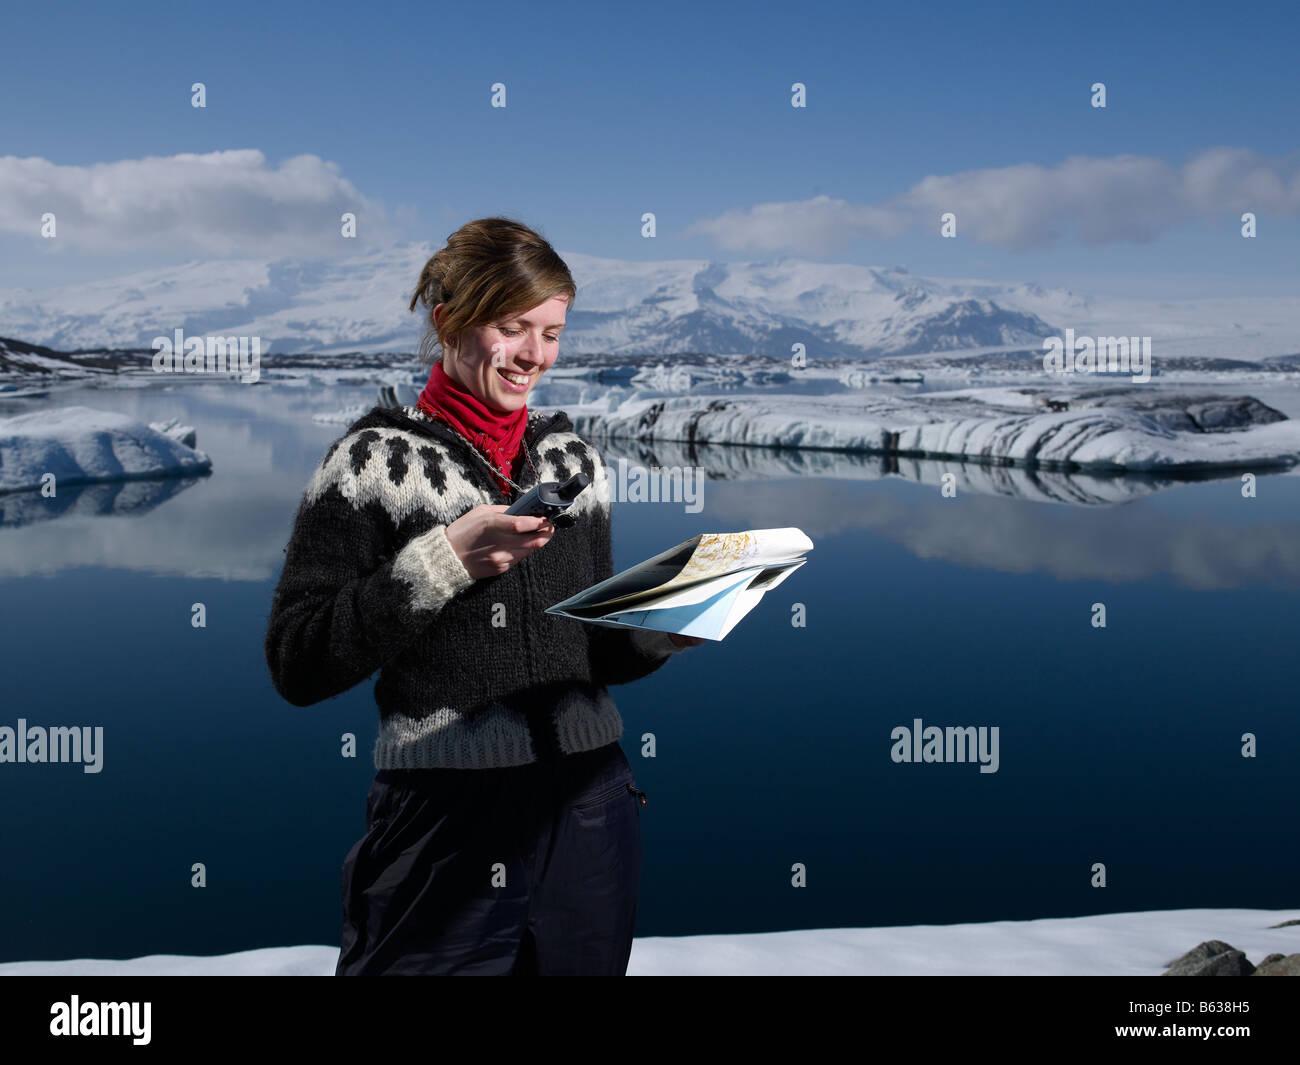 Icelandic girl with map at Jokulsarlon Glacial Lagoon, Breidamerkurjokull glacier, Eastern Iceland - Stock Image